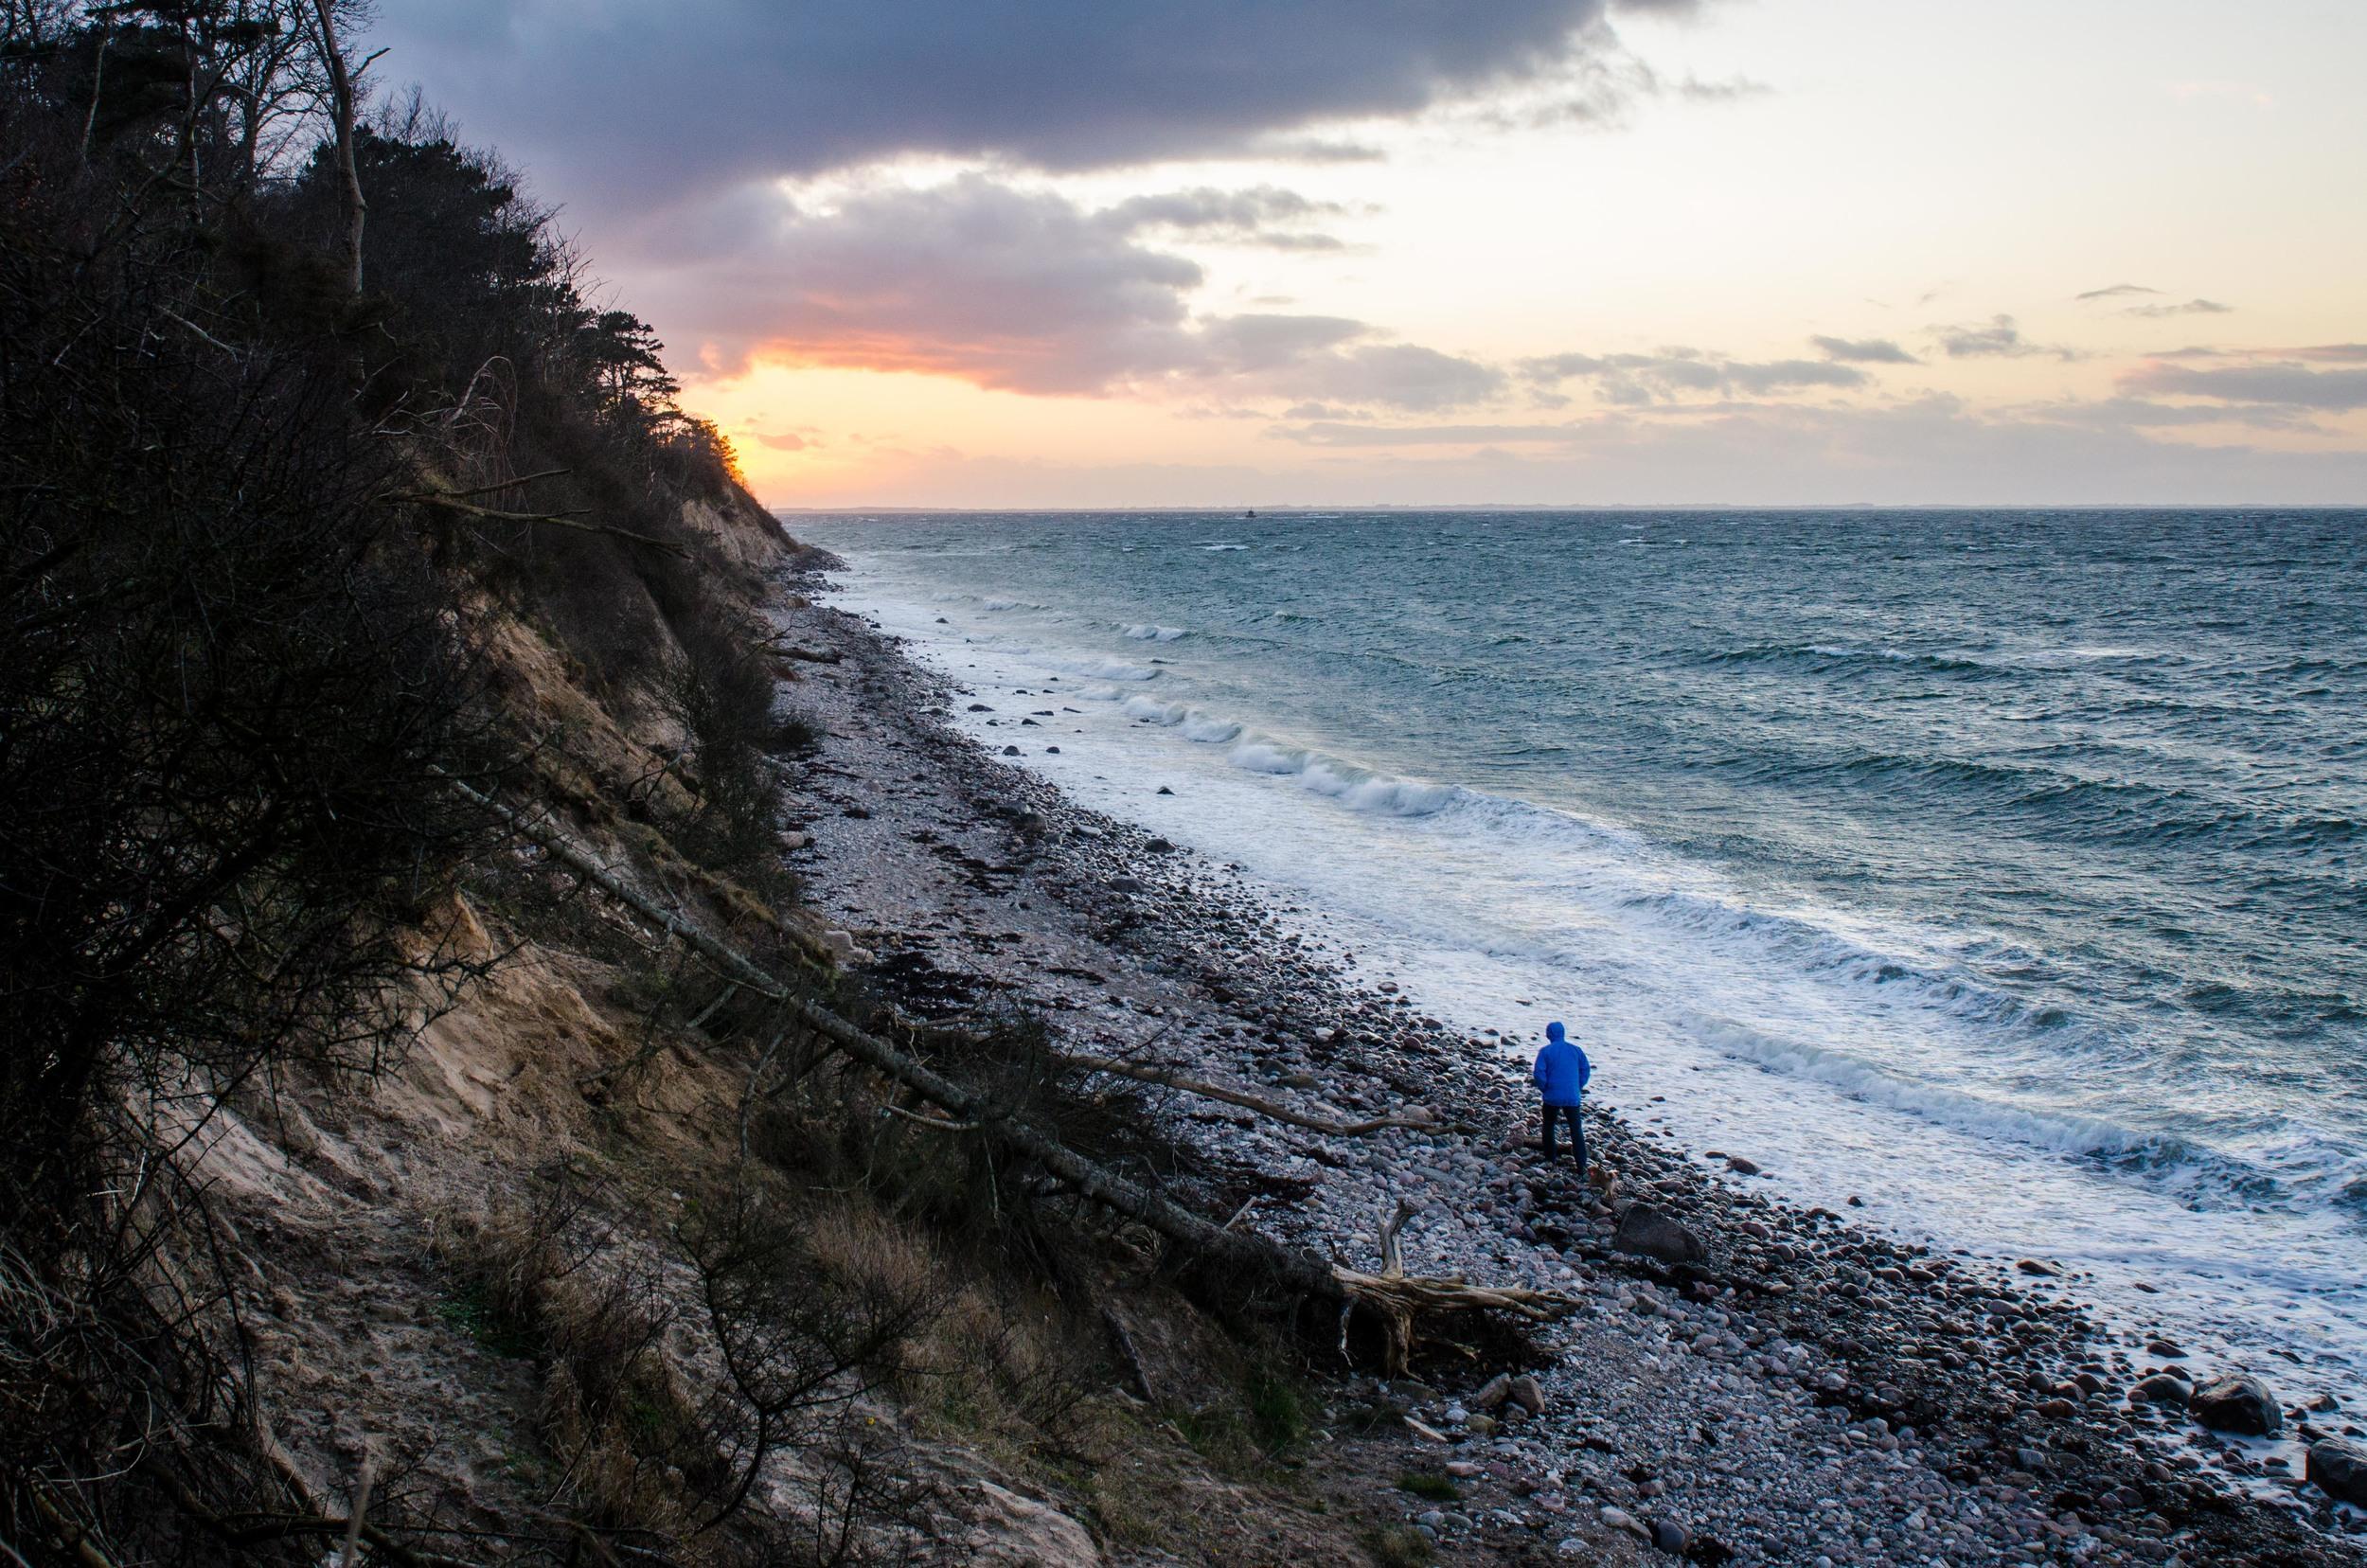 Adventure_photographer_ocean_sea_walk_sunset-2.jpg